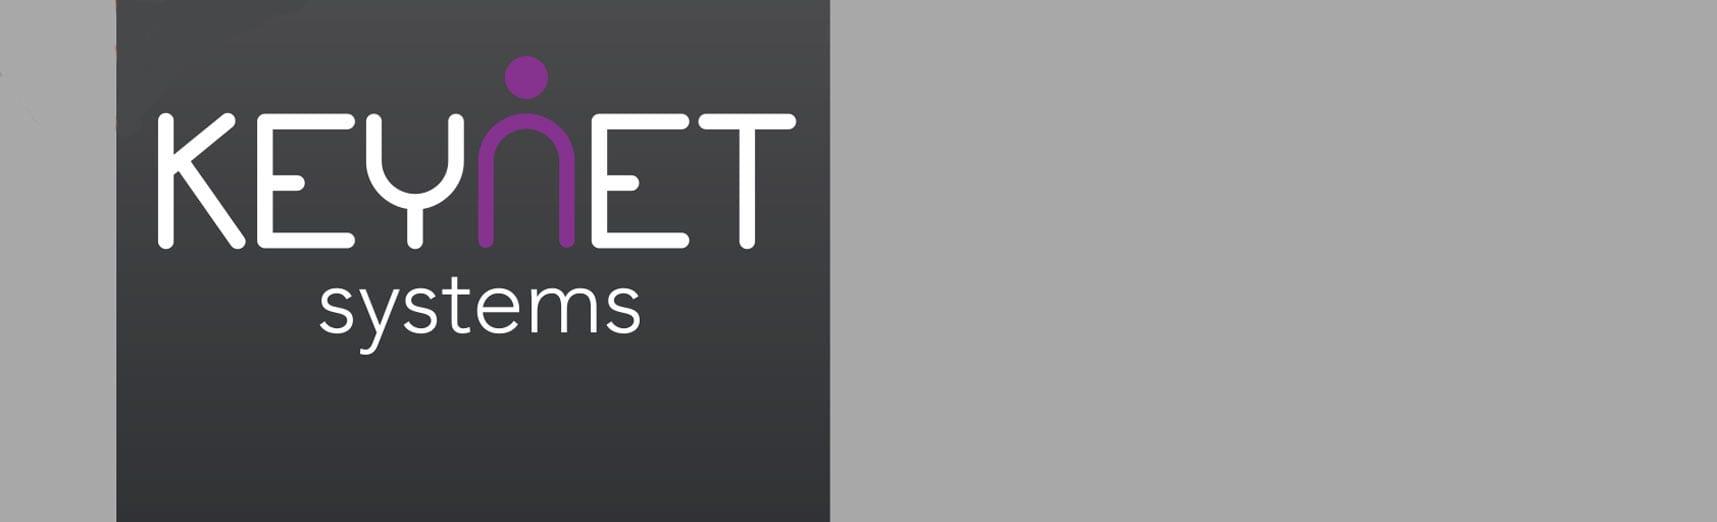 keynet-systems-cabecera